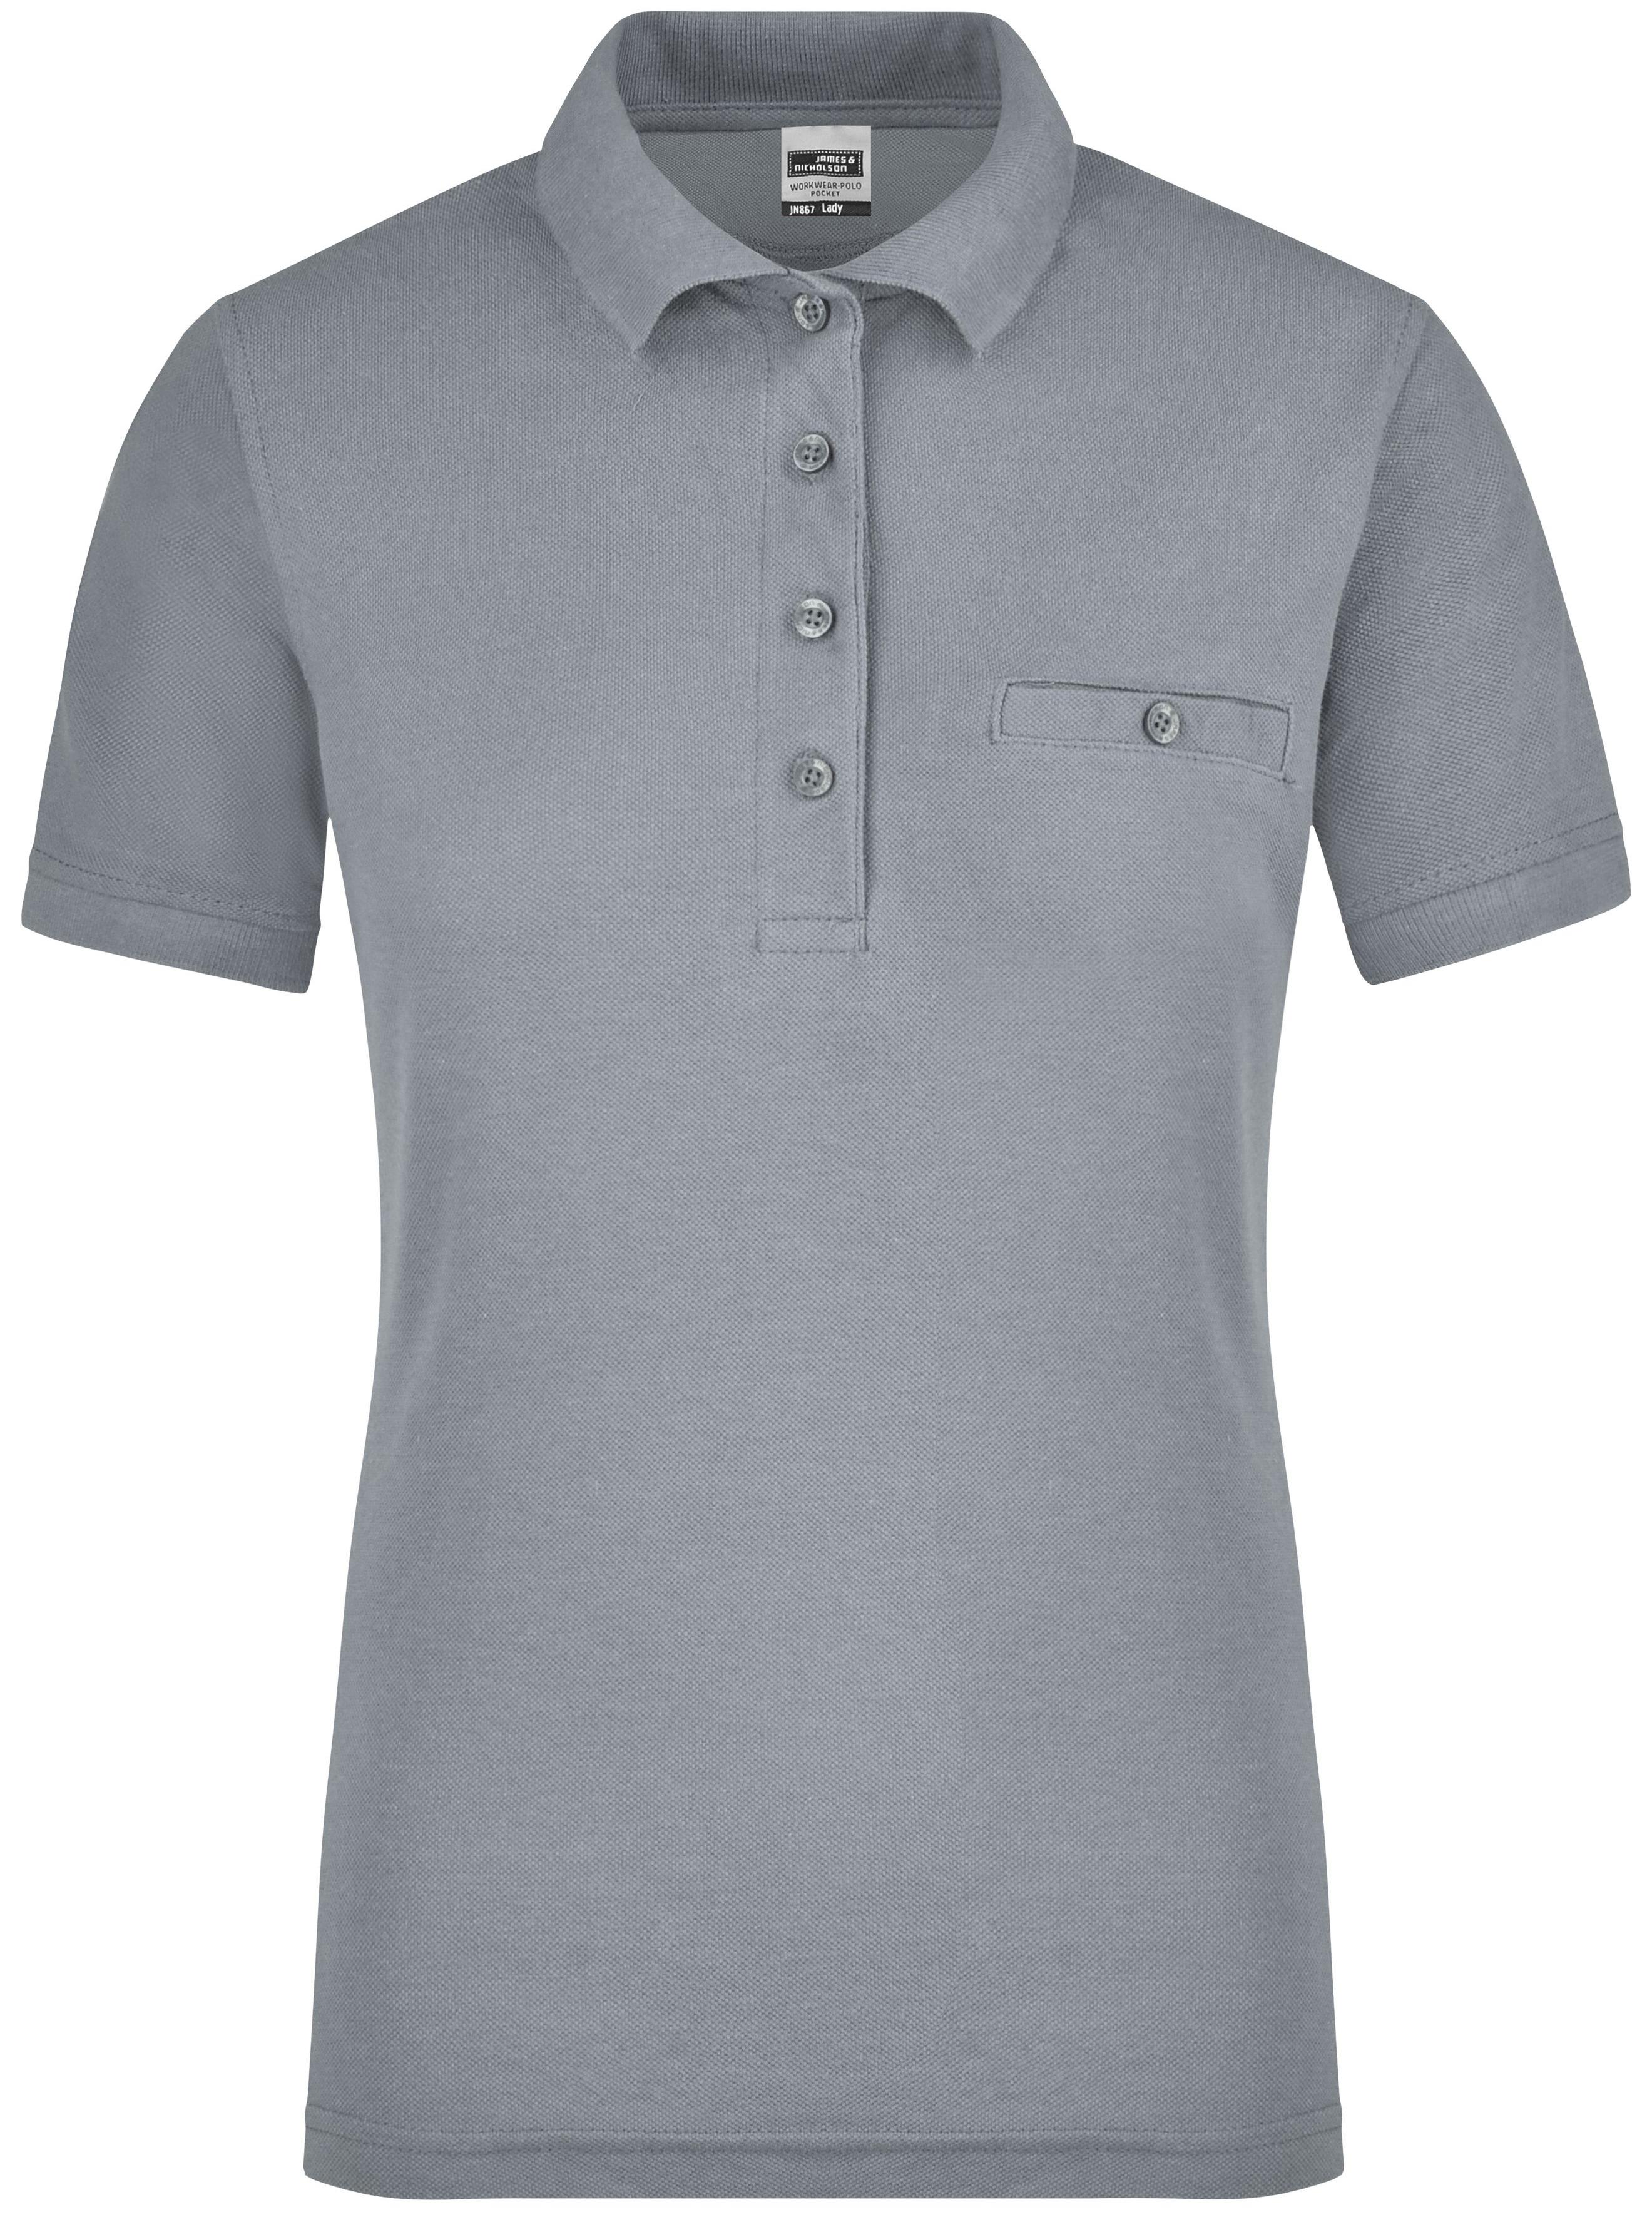 Poloshirt Workwear Pocket Damen